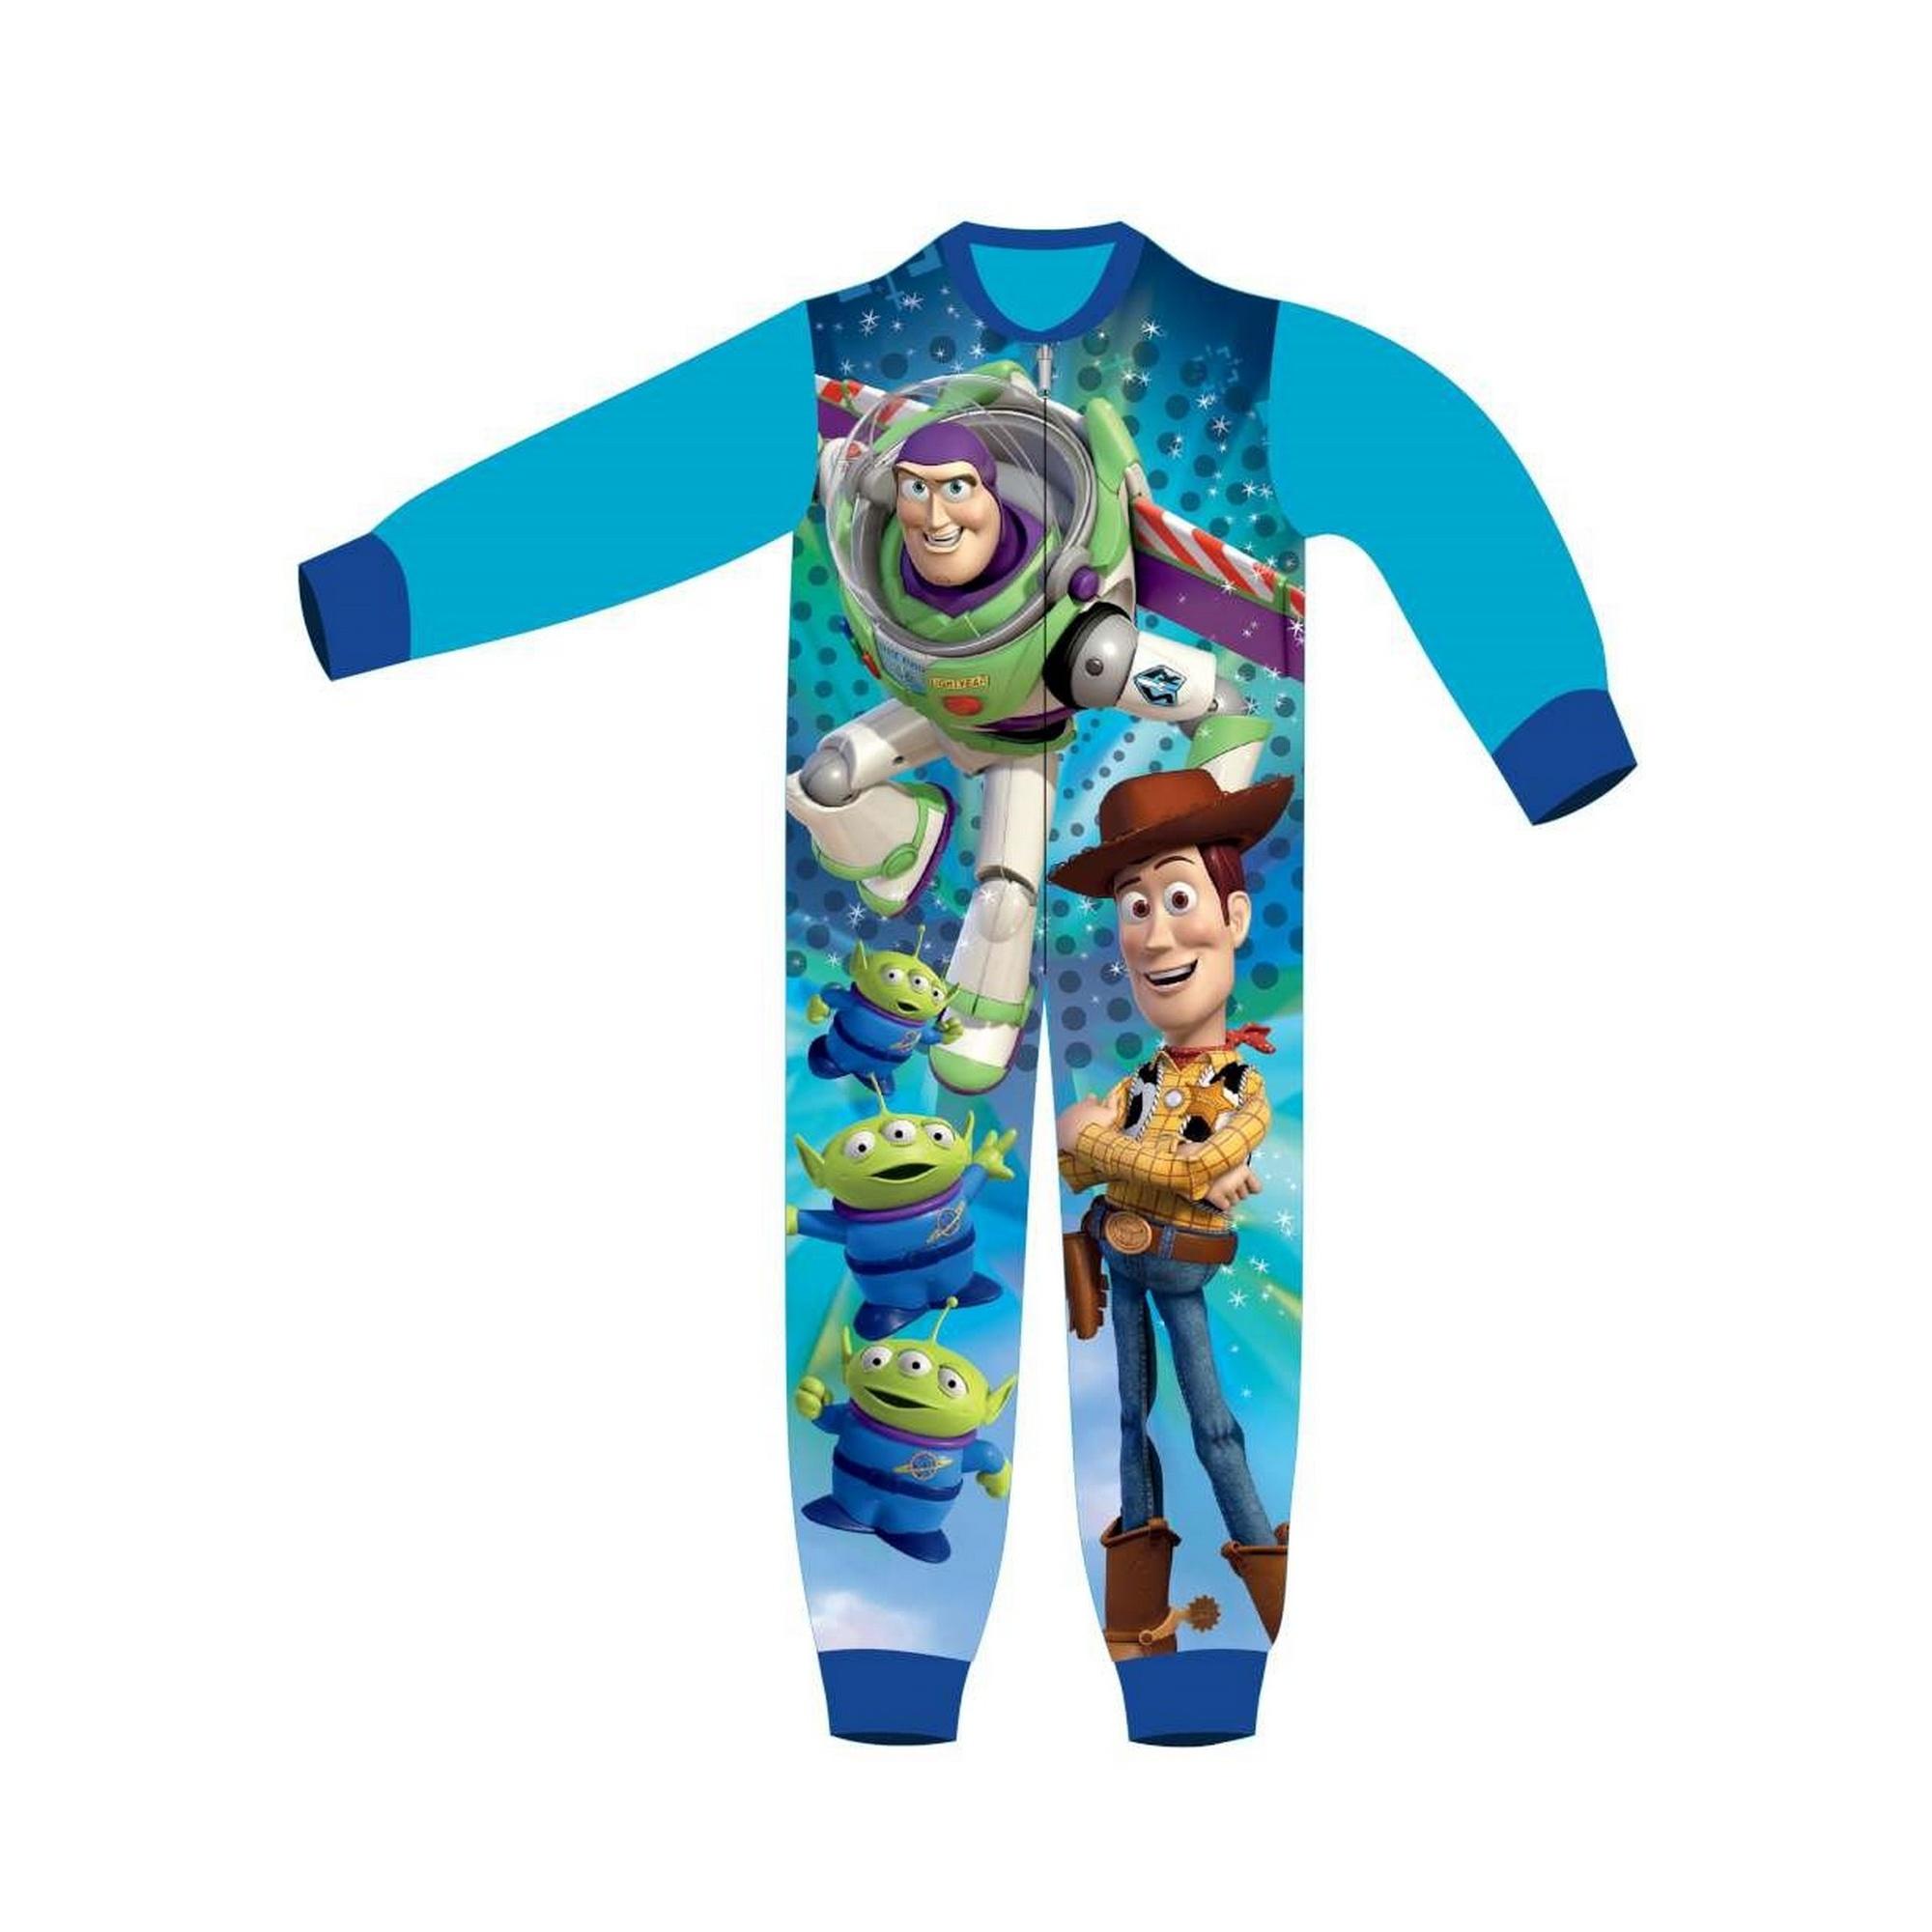 Toy-Story-Pijama-infantil-de-una-pieza-de-Toy-Story-TF600